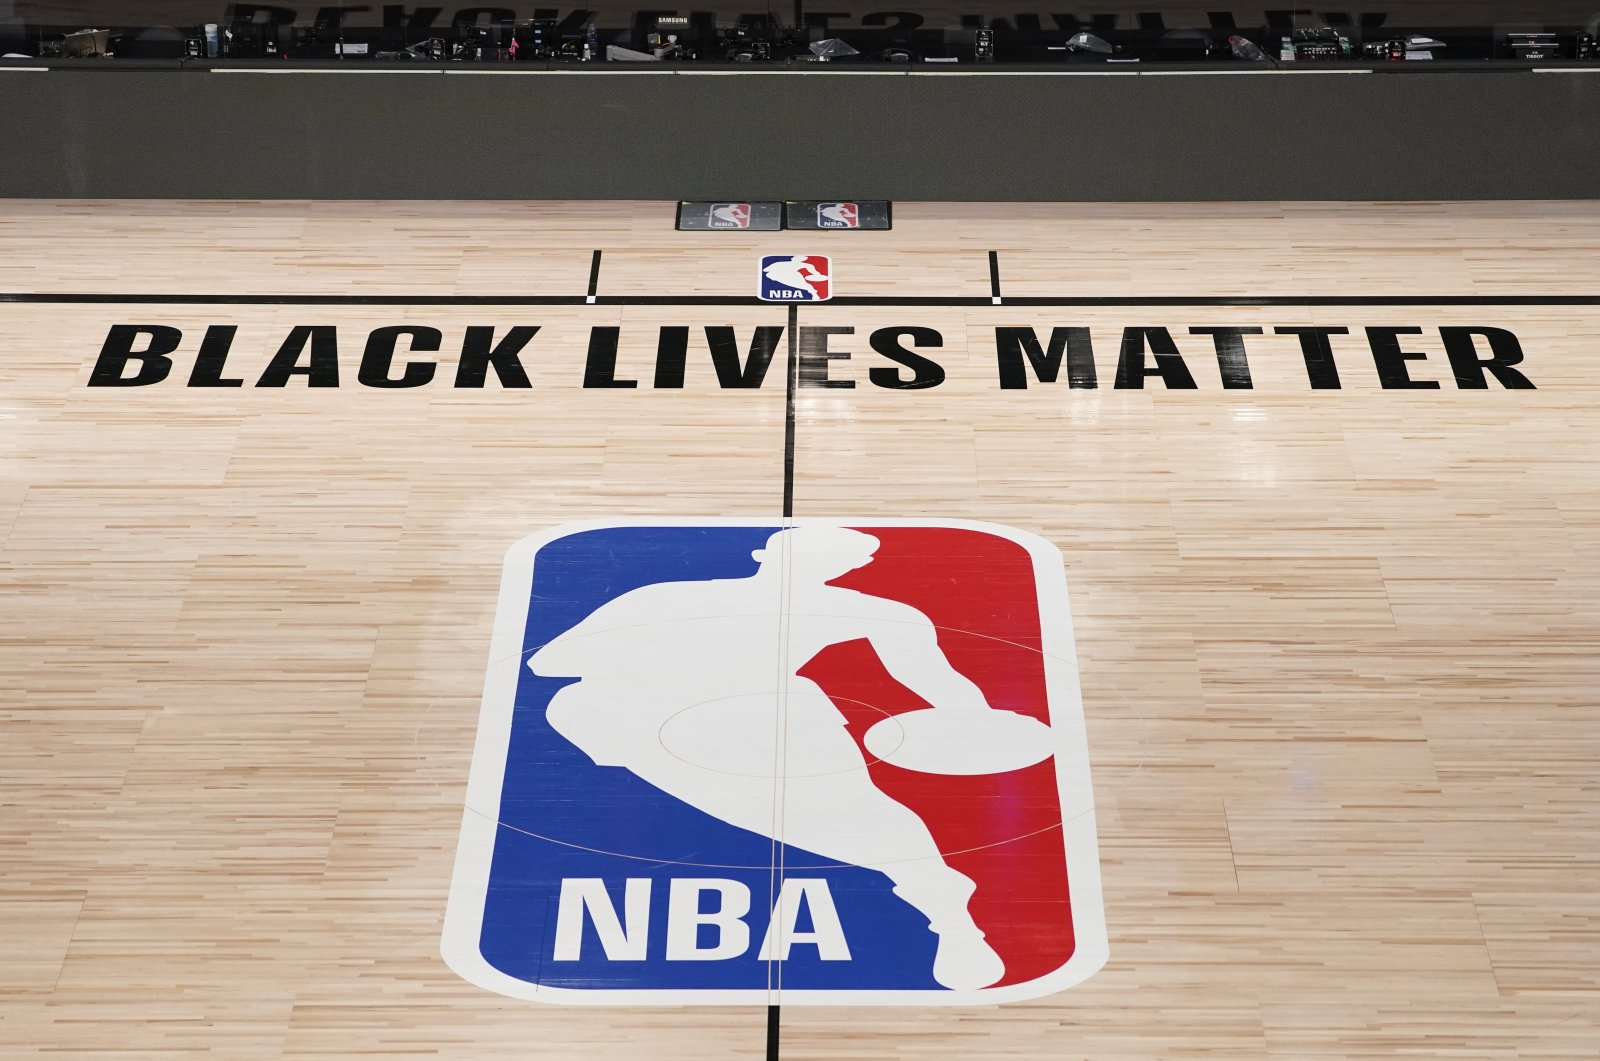 NBA logo is displayed in an empty basketball arena in Lake Buena Vista, Florida, U.S., Aug. 28, 2020. (AP Photo)